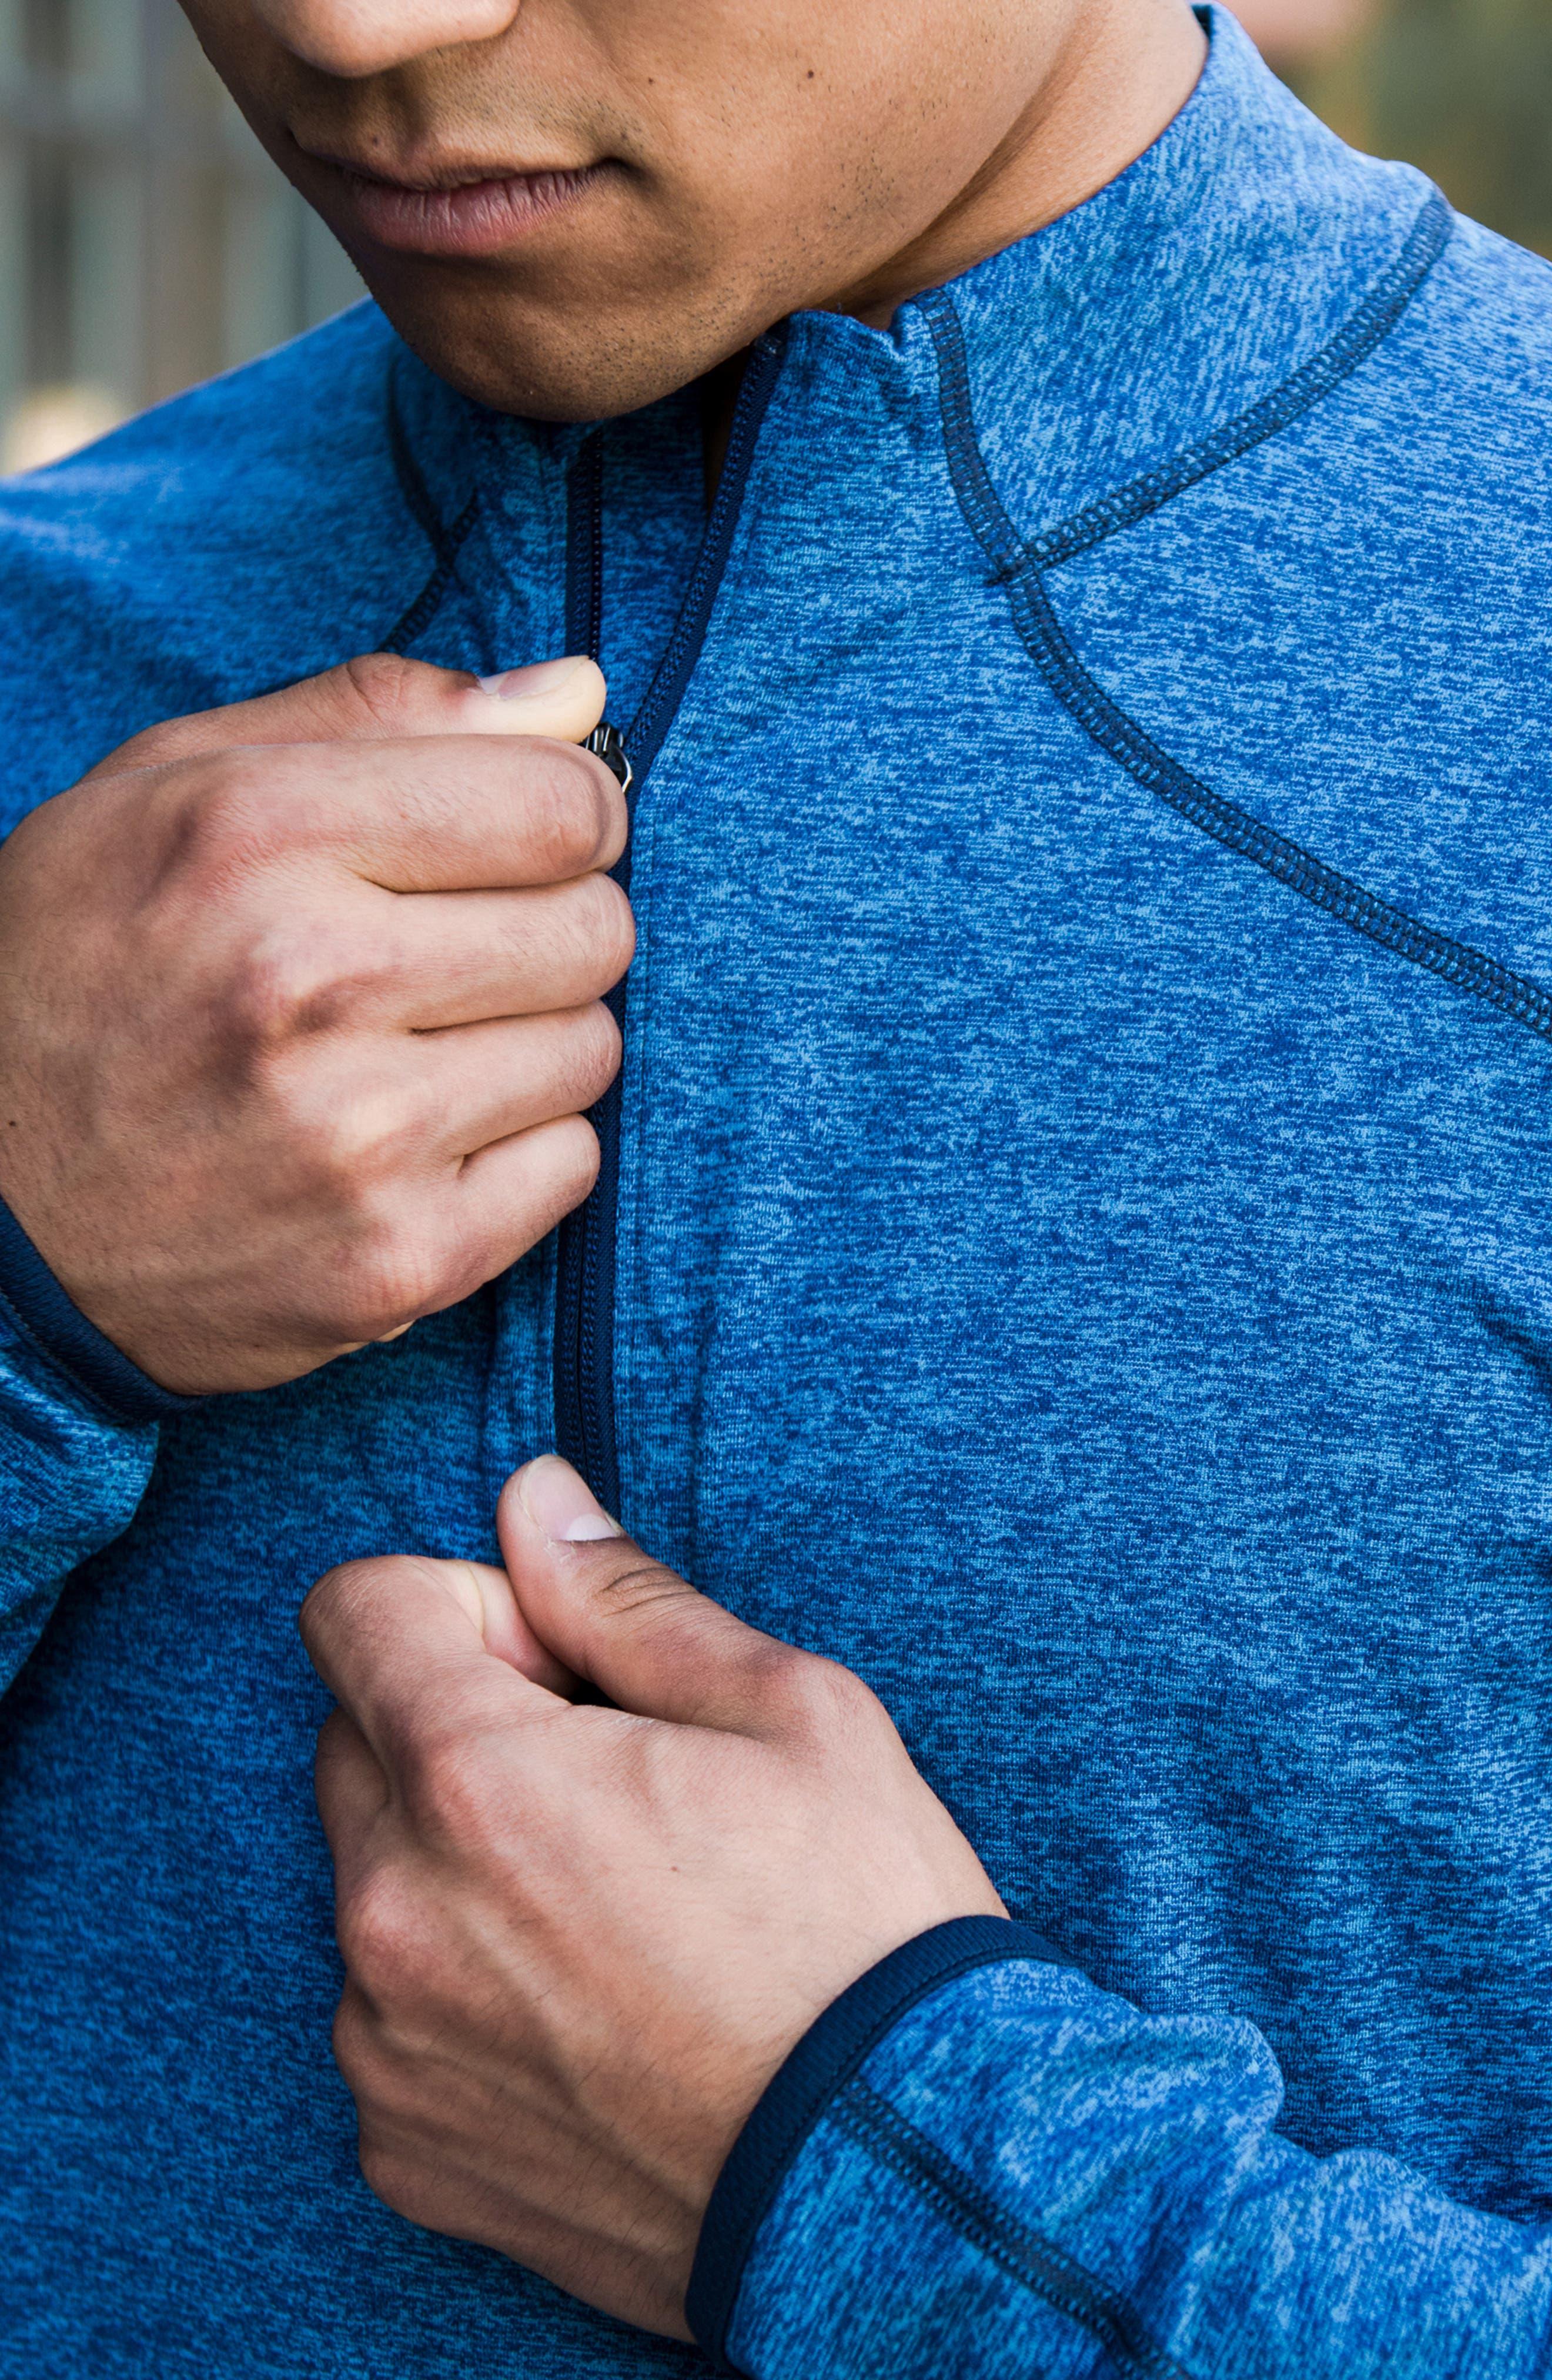 SODO, 'Elevate' Moisture Wicking Stretch Quarter Zip Pullover, Alternate thumbnail 2, color, OCEAN BLUE/ NAVY